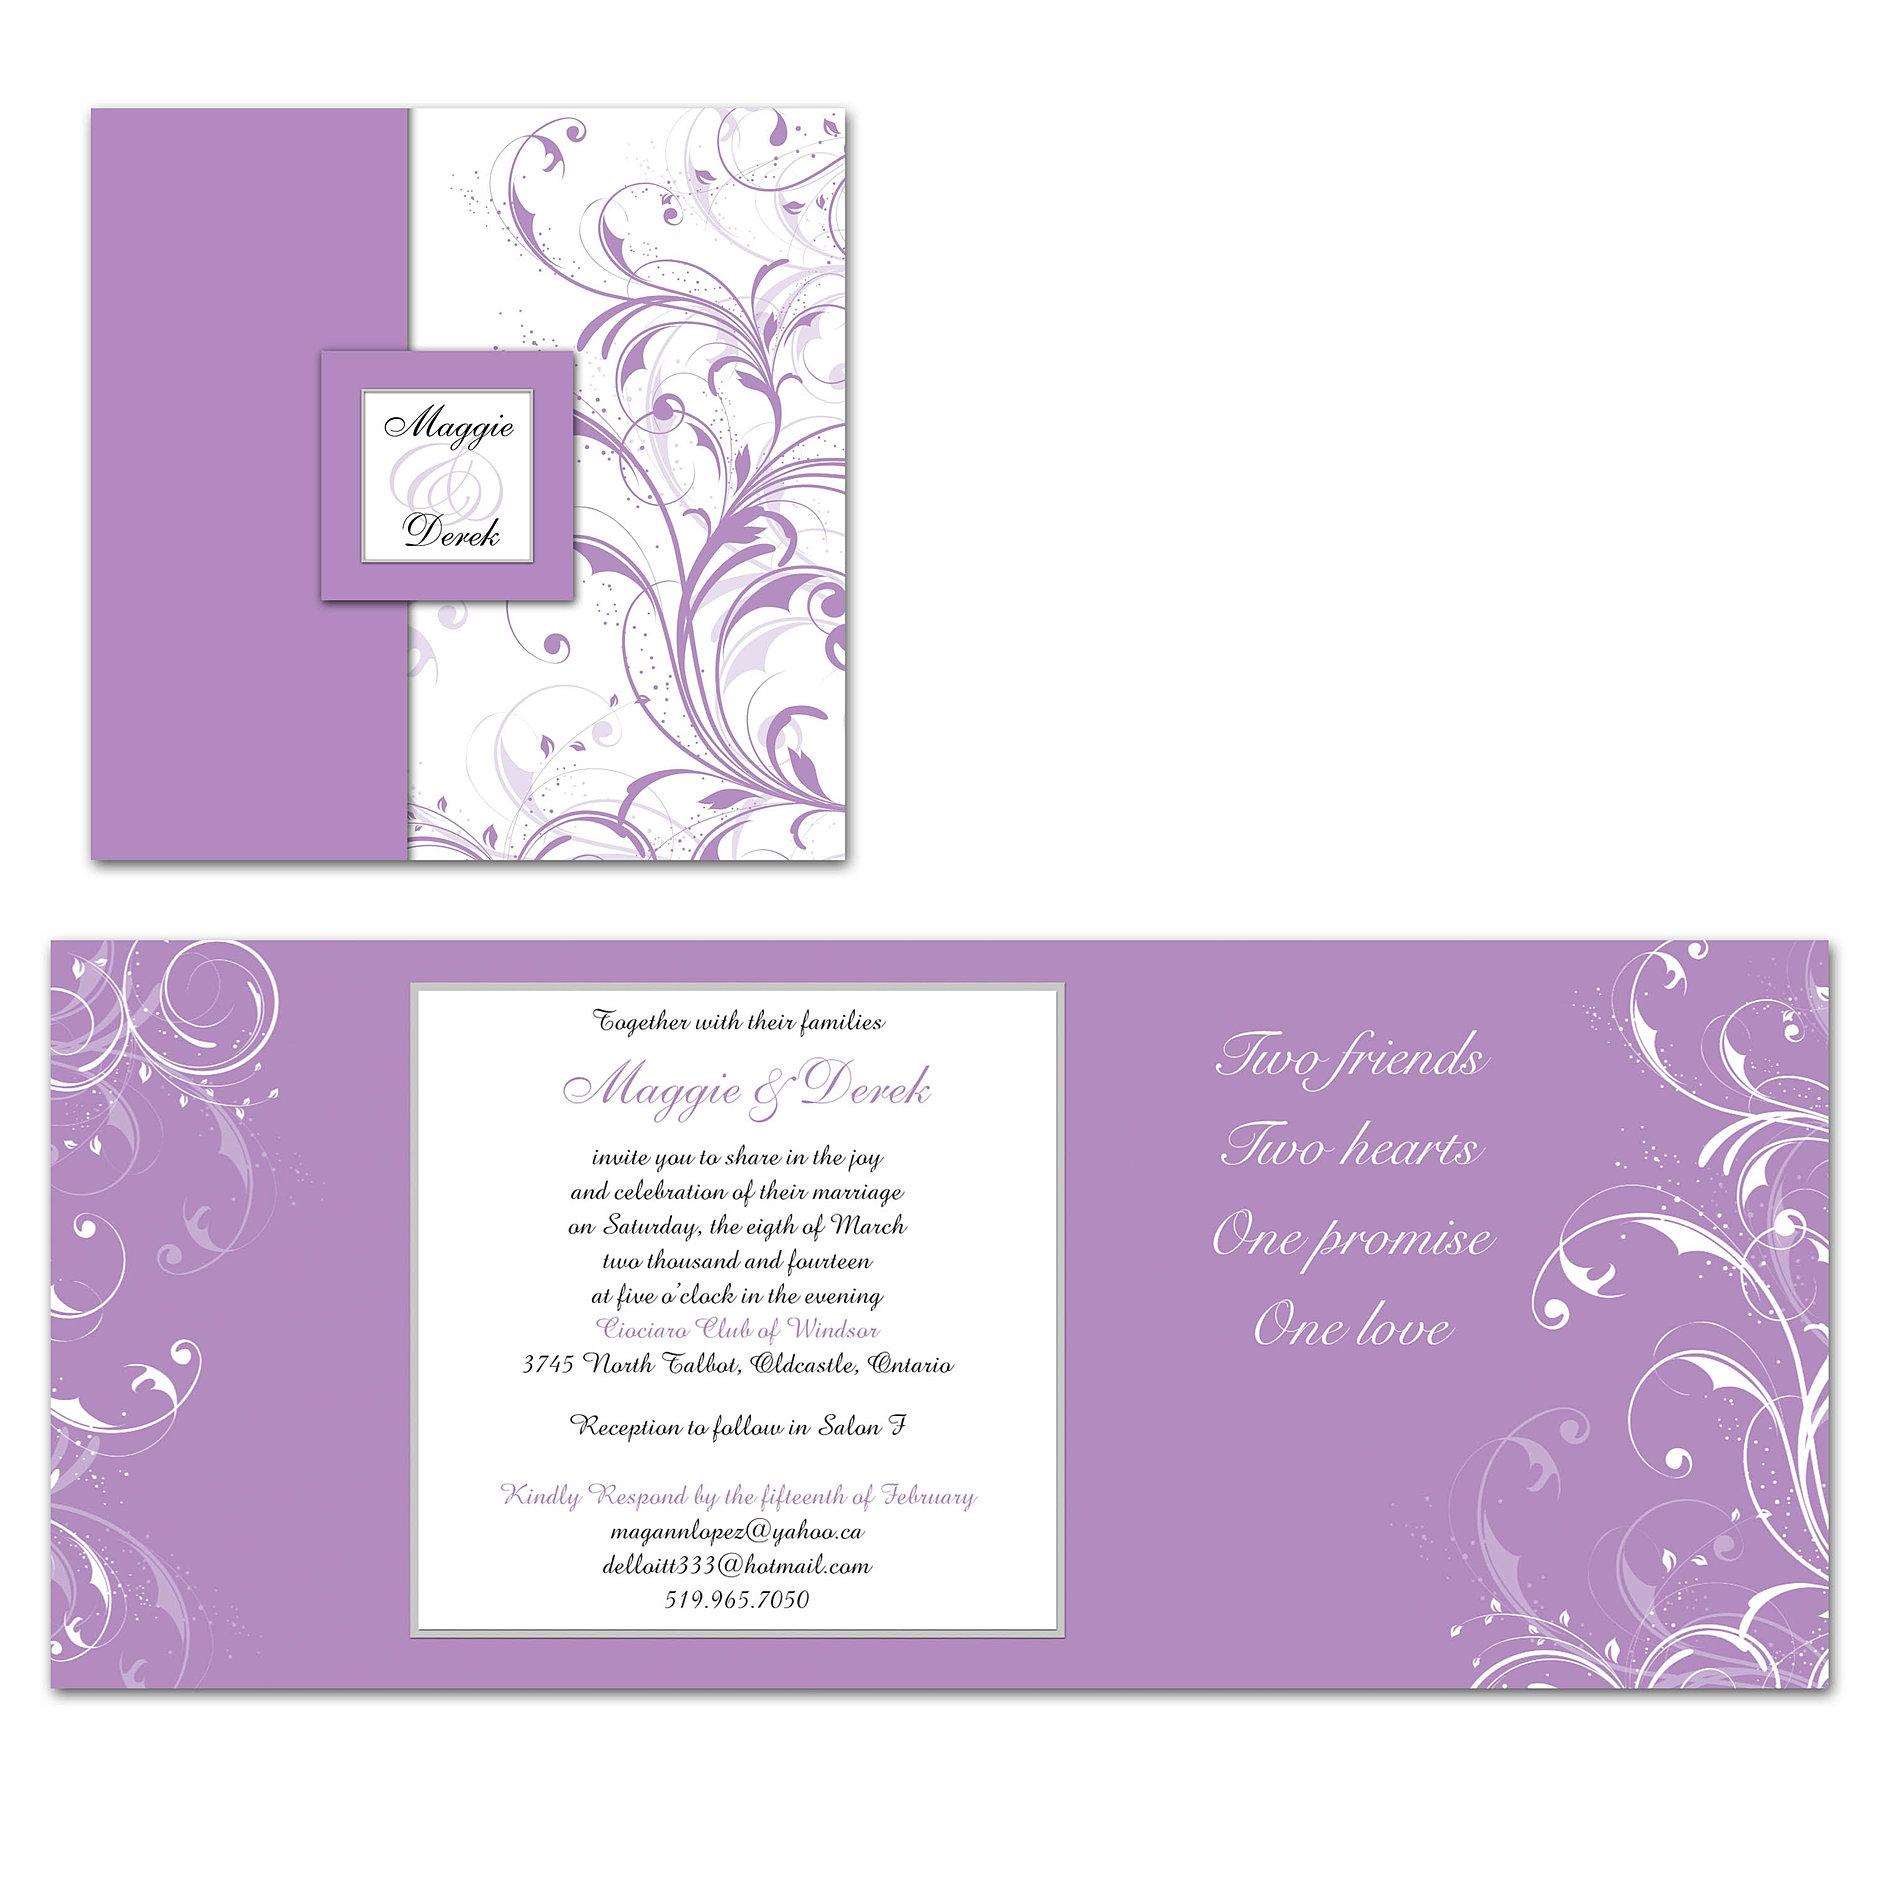 sertan design | Weddings Invitations